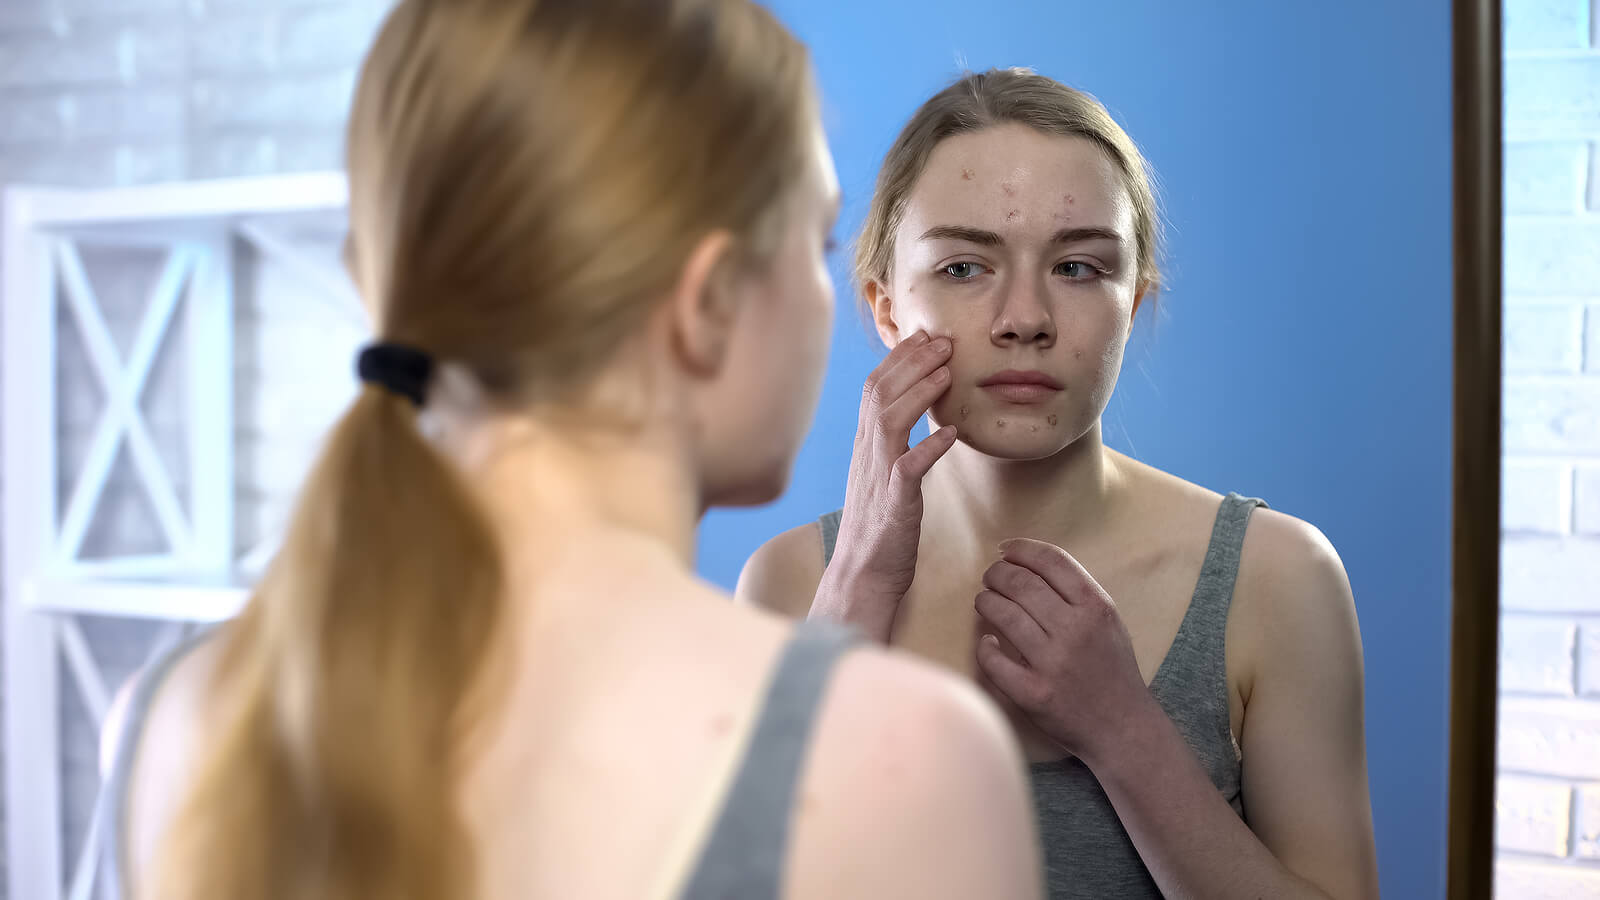 Chica adolescente con acné juvenil.